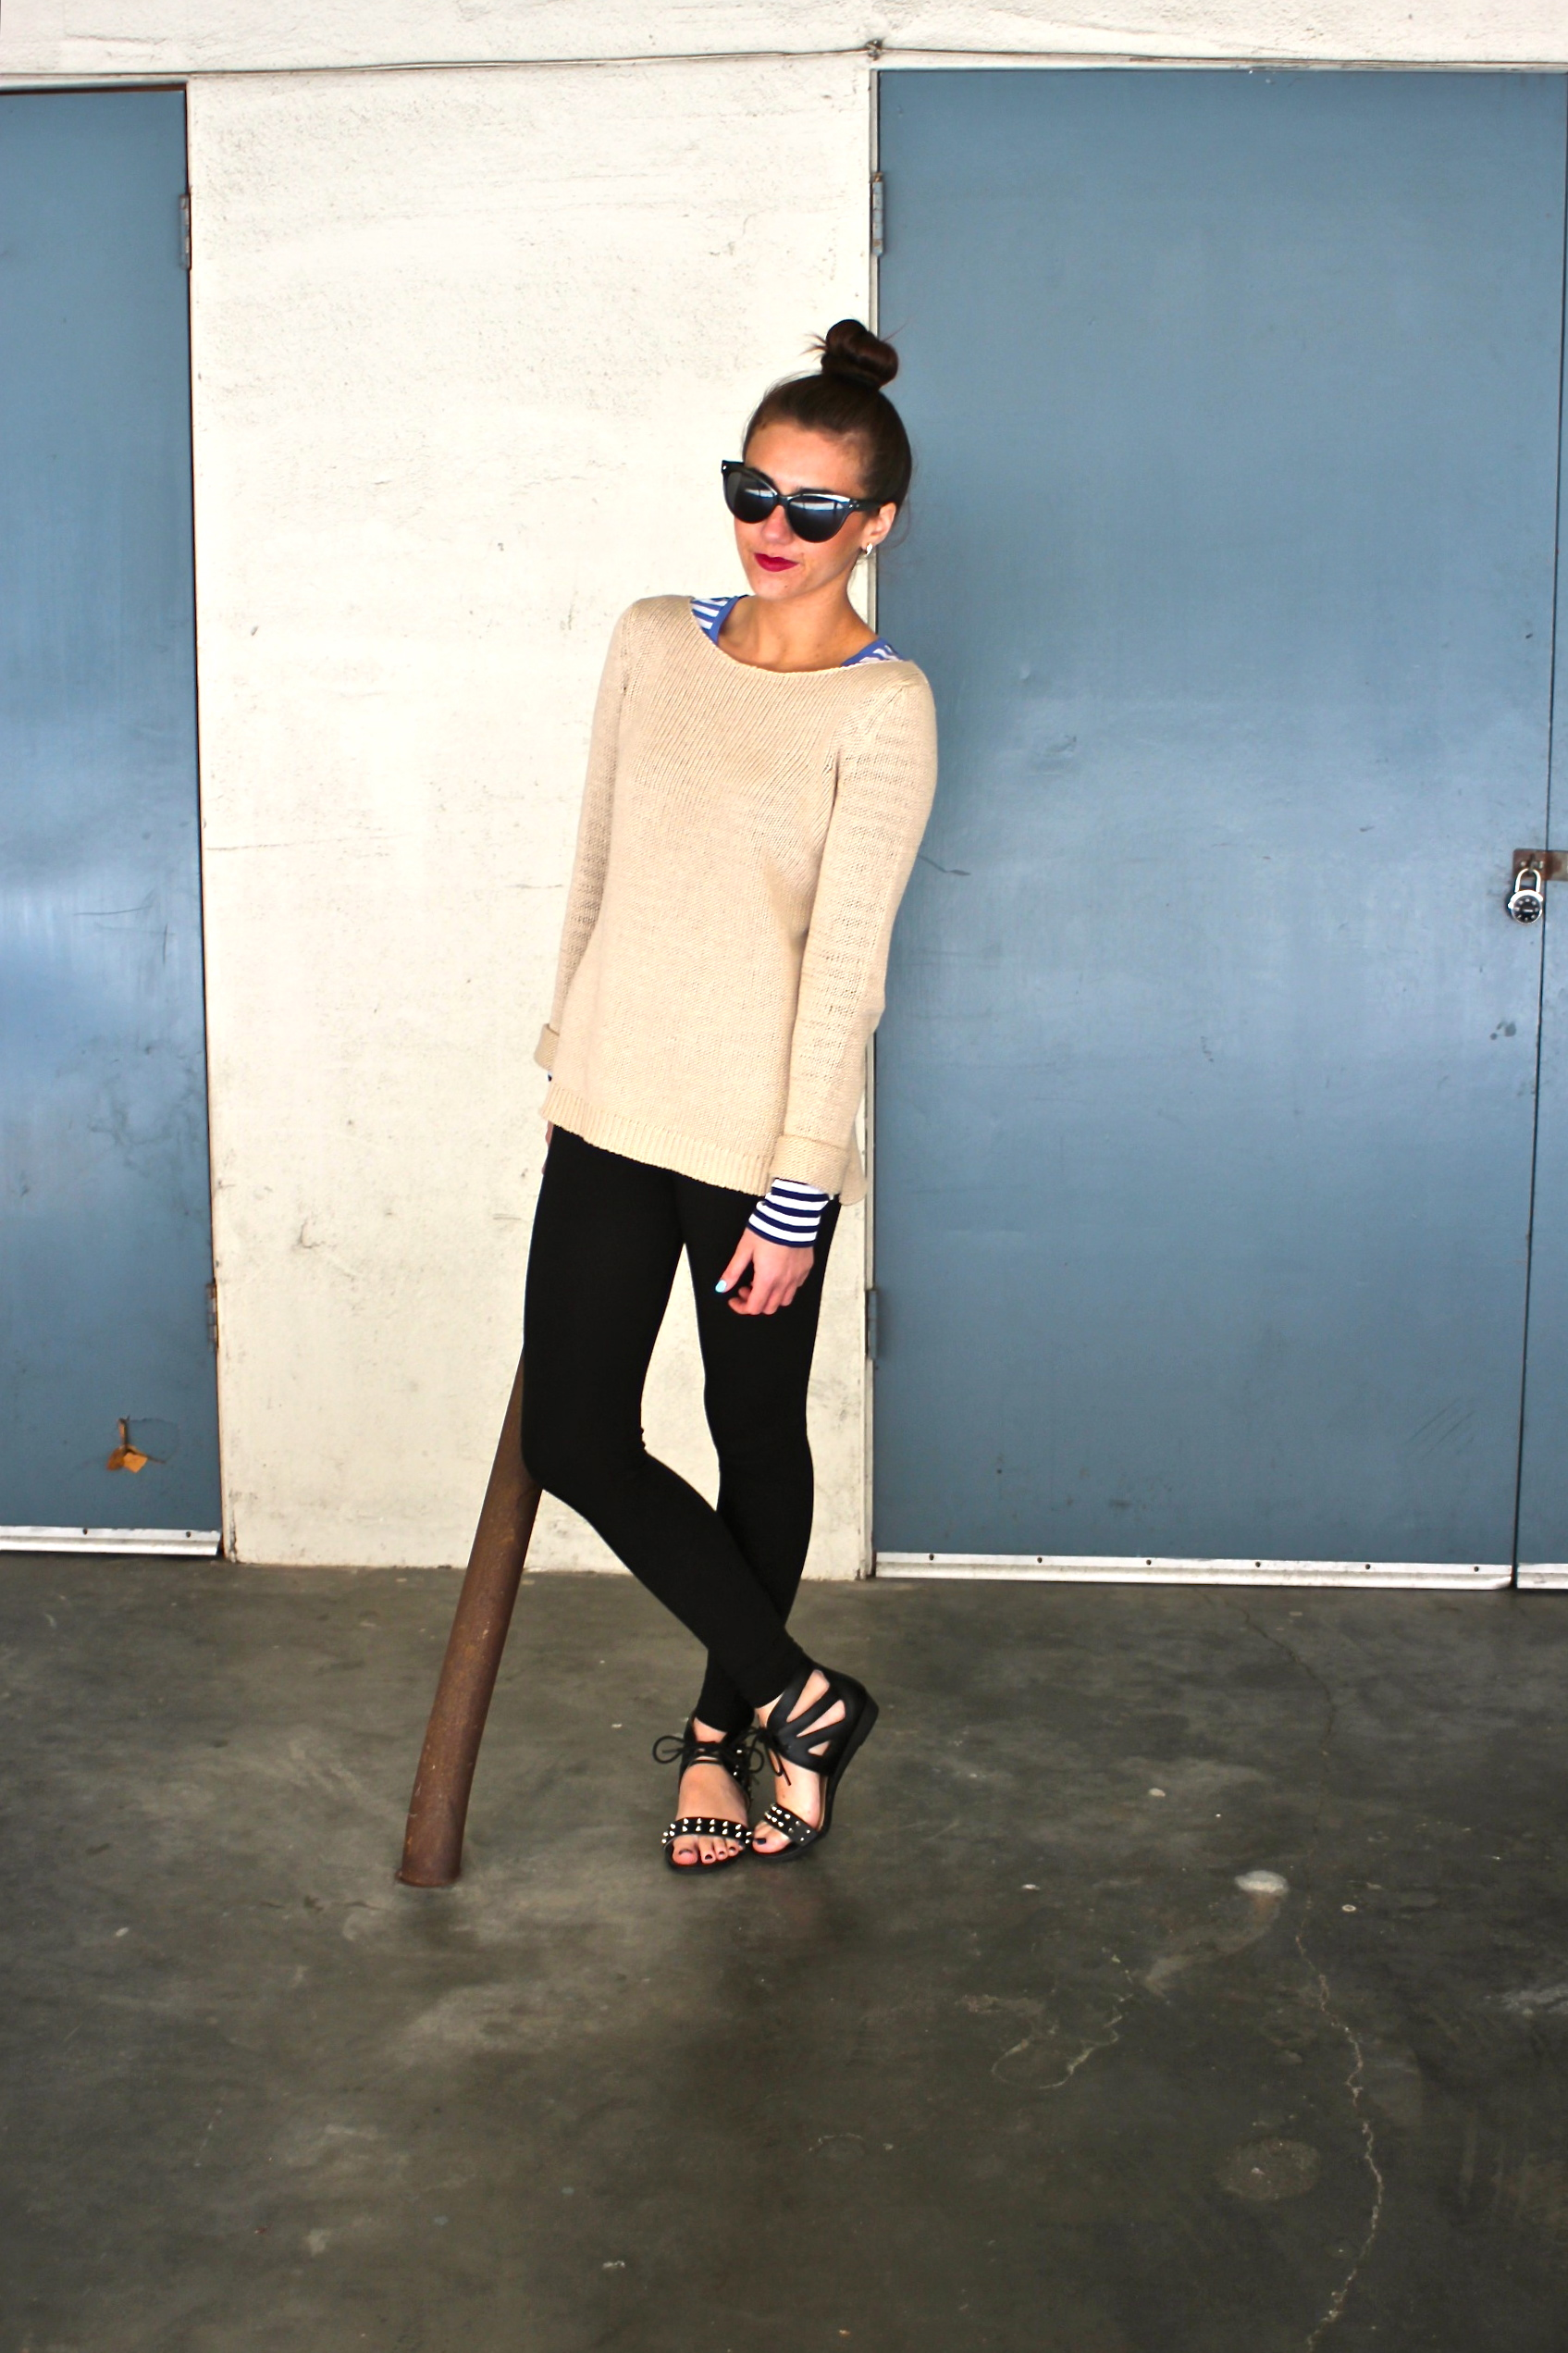 Stripe Top : Jigsaw London |  Luxury Cotton Tunic:  Kew |  Leggings : Jigsaw London | Helaine Sandals: MIA